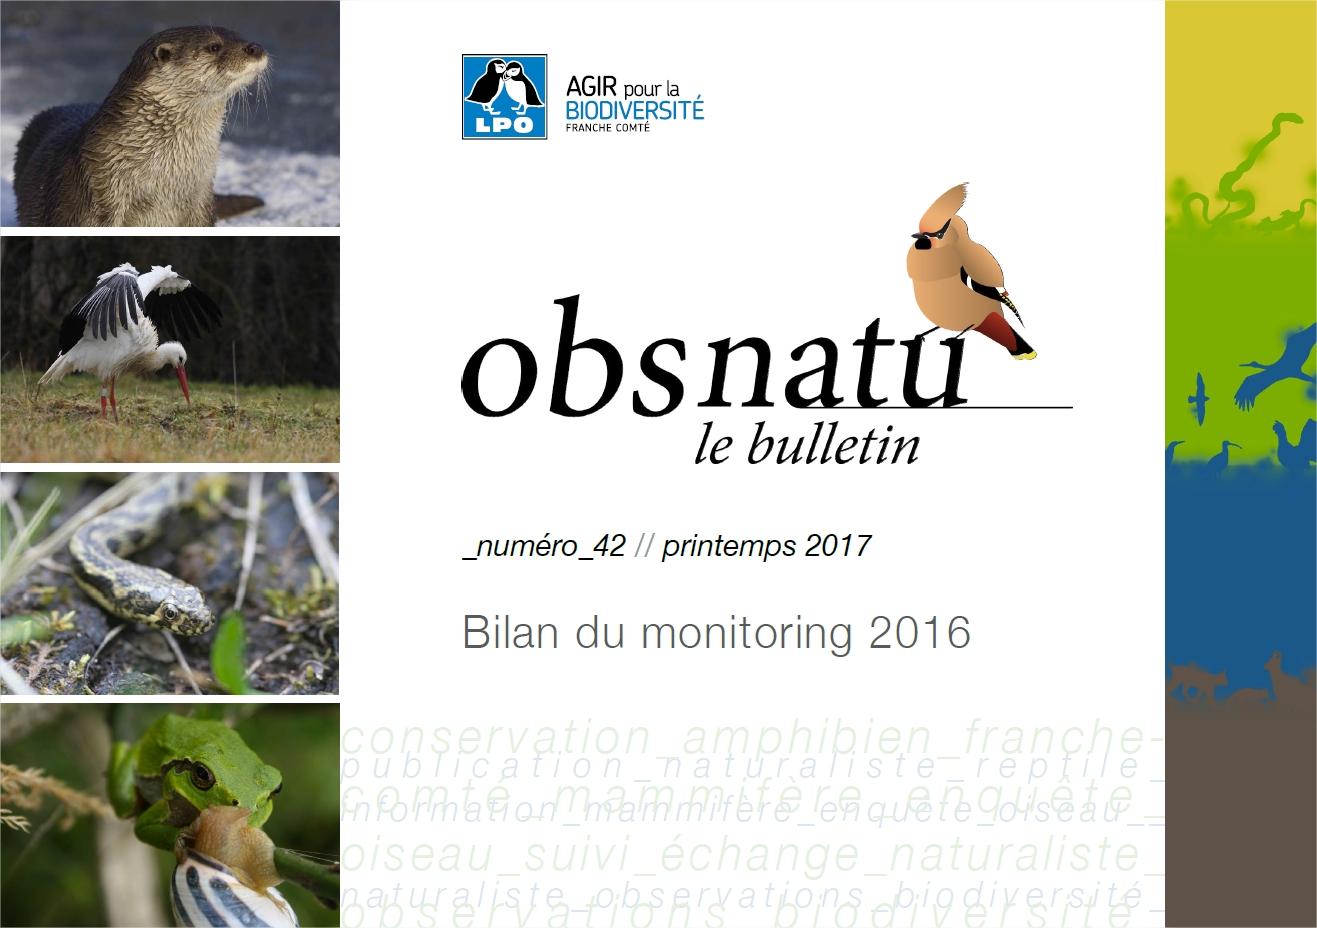 https://cdnfiles2.biolovision.net/franche-comte.lpo.fr/userfiles/publications/Obsnatubulls/obsnatu42printemps2017-monitoring2016vf-copie.pdf